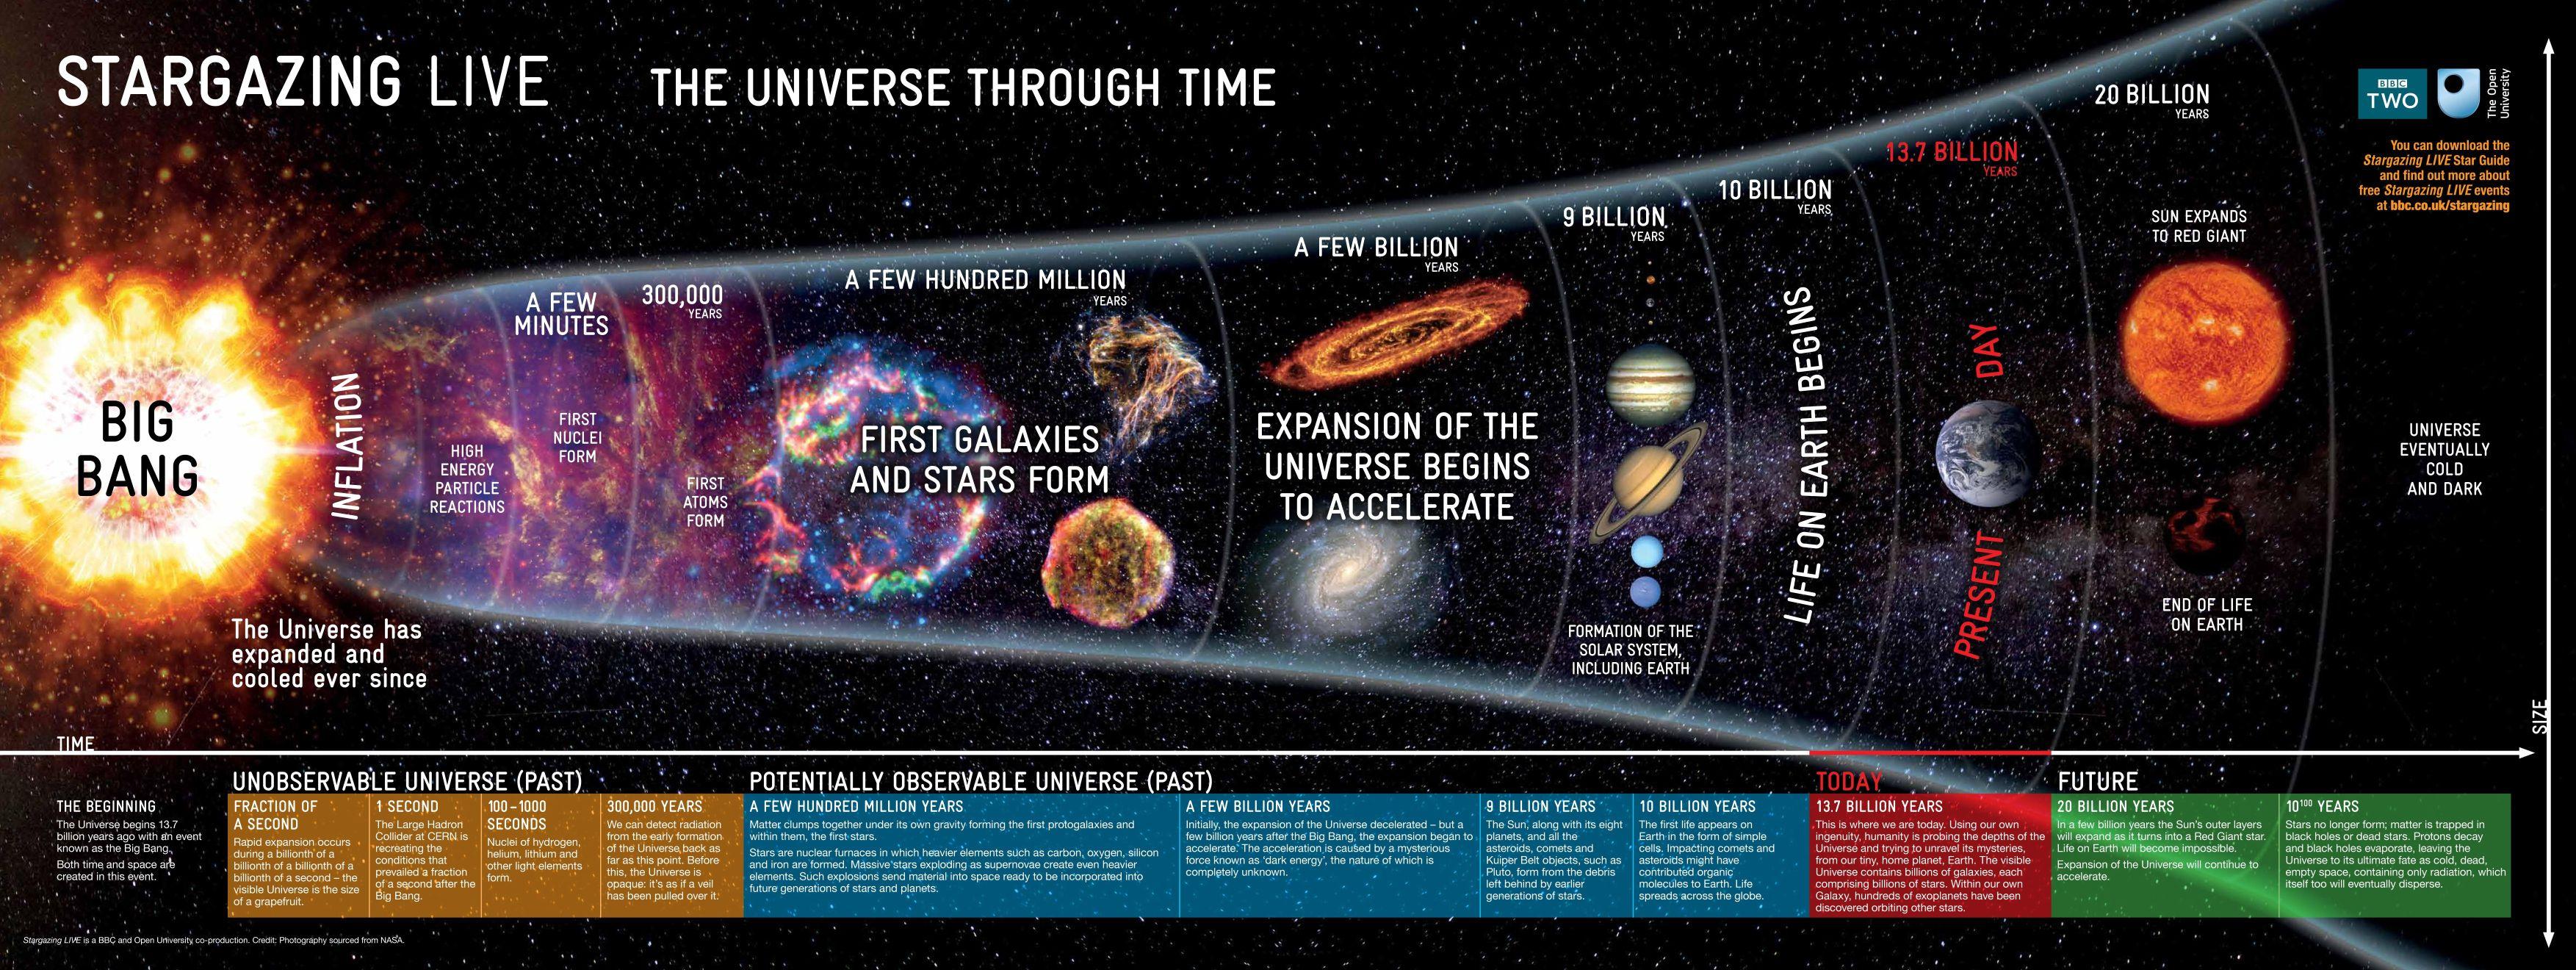 Academic Calendar Stanford Academics Stanford University Roger Launiuss Blog Commenting On Spaceflight History